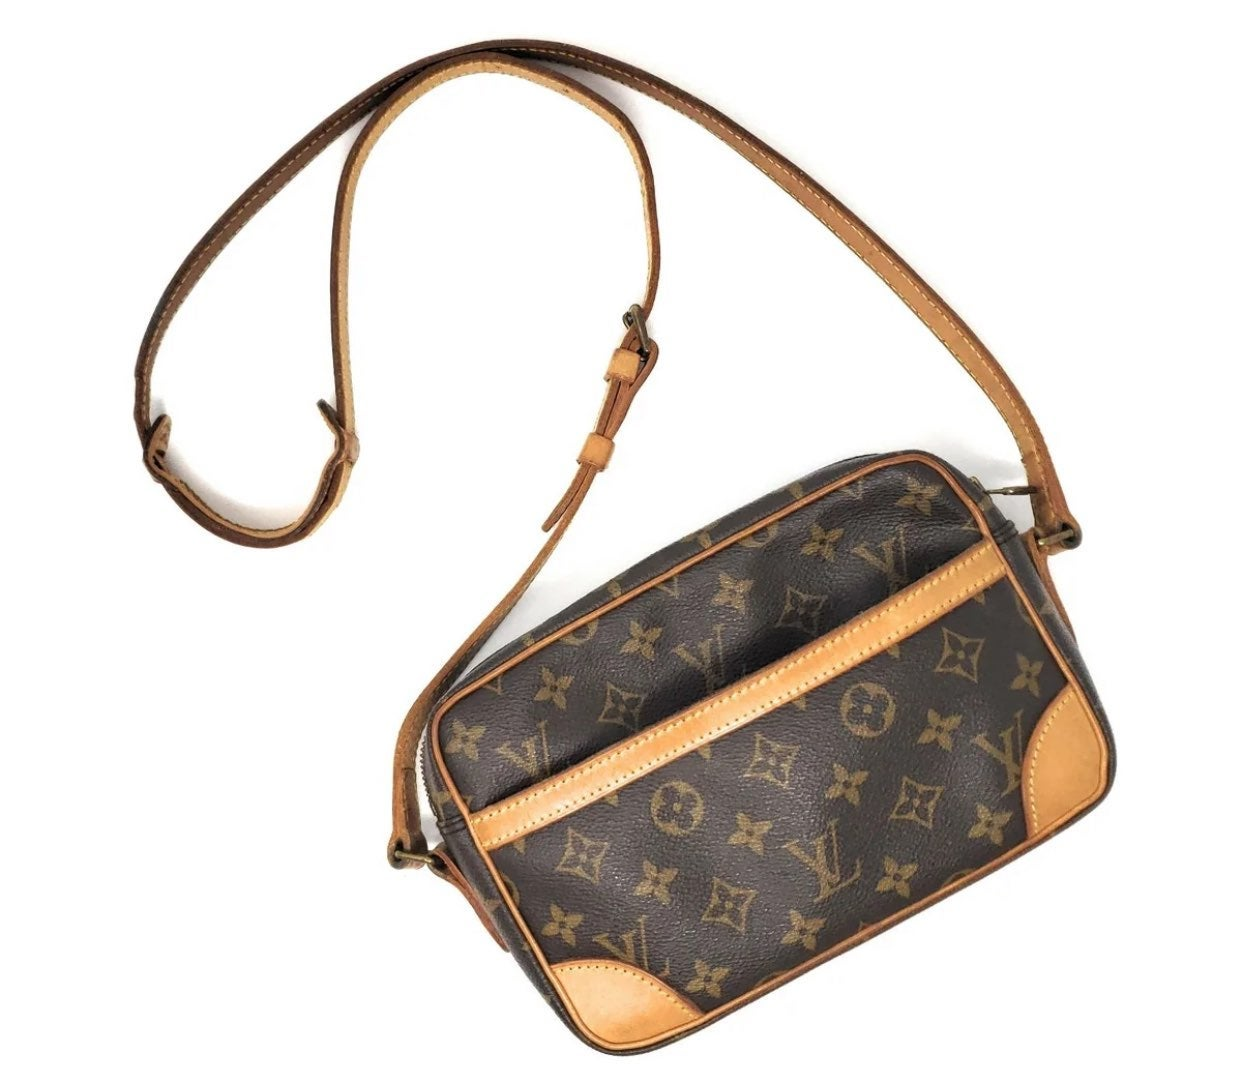 Louis Vuitton Reporter PM Xbody